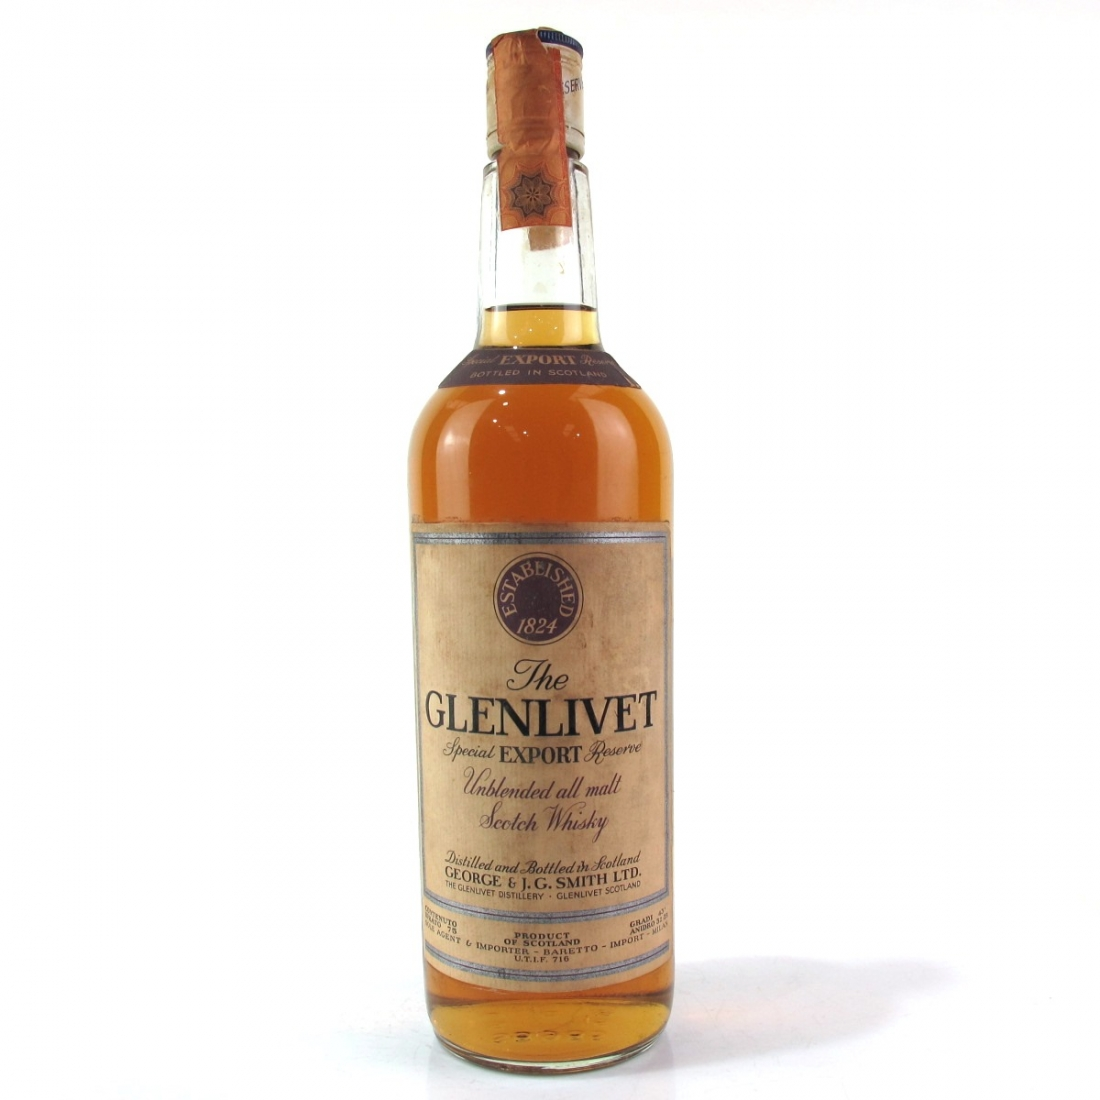 Glenlivet Special Export Reserve 1970s / Baretto Import